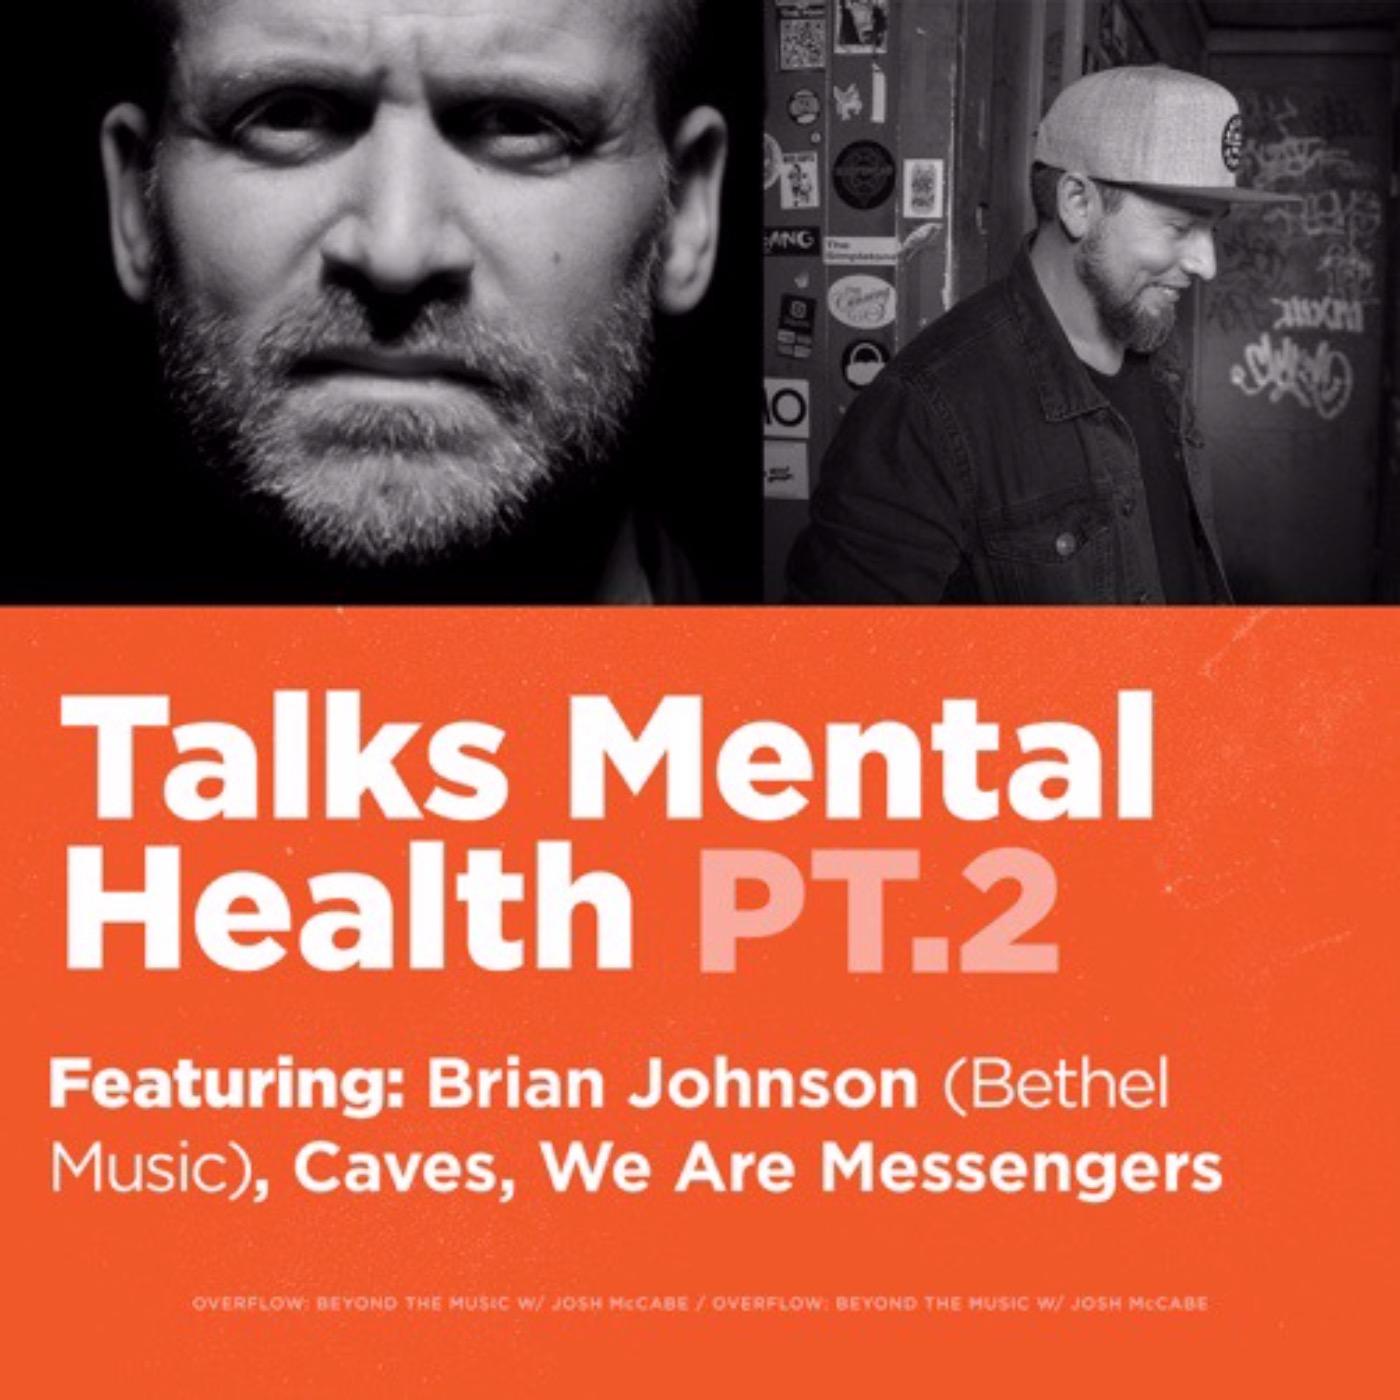 Talking Mental Health Part 2